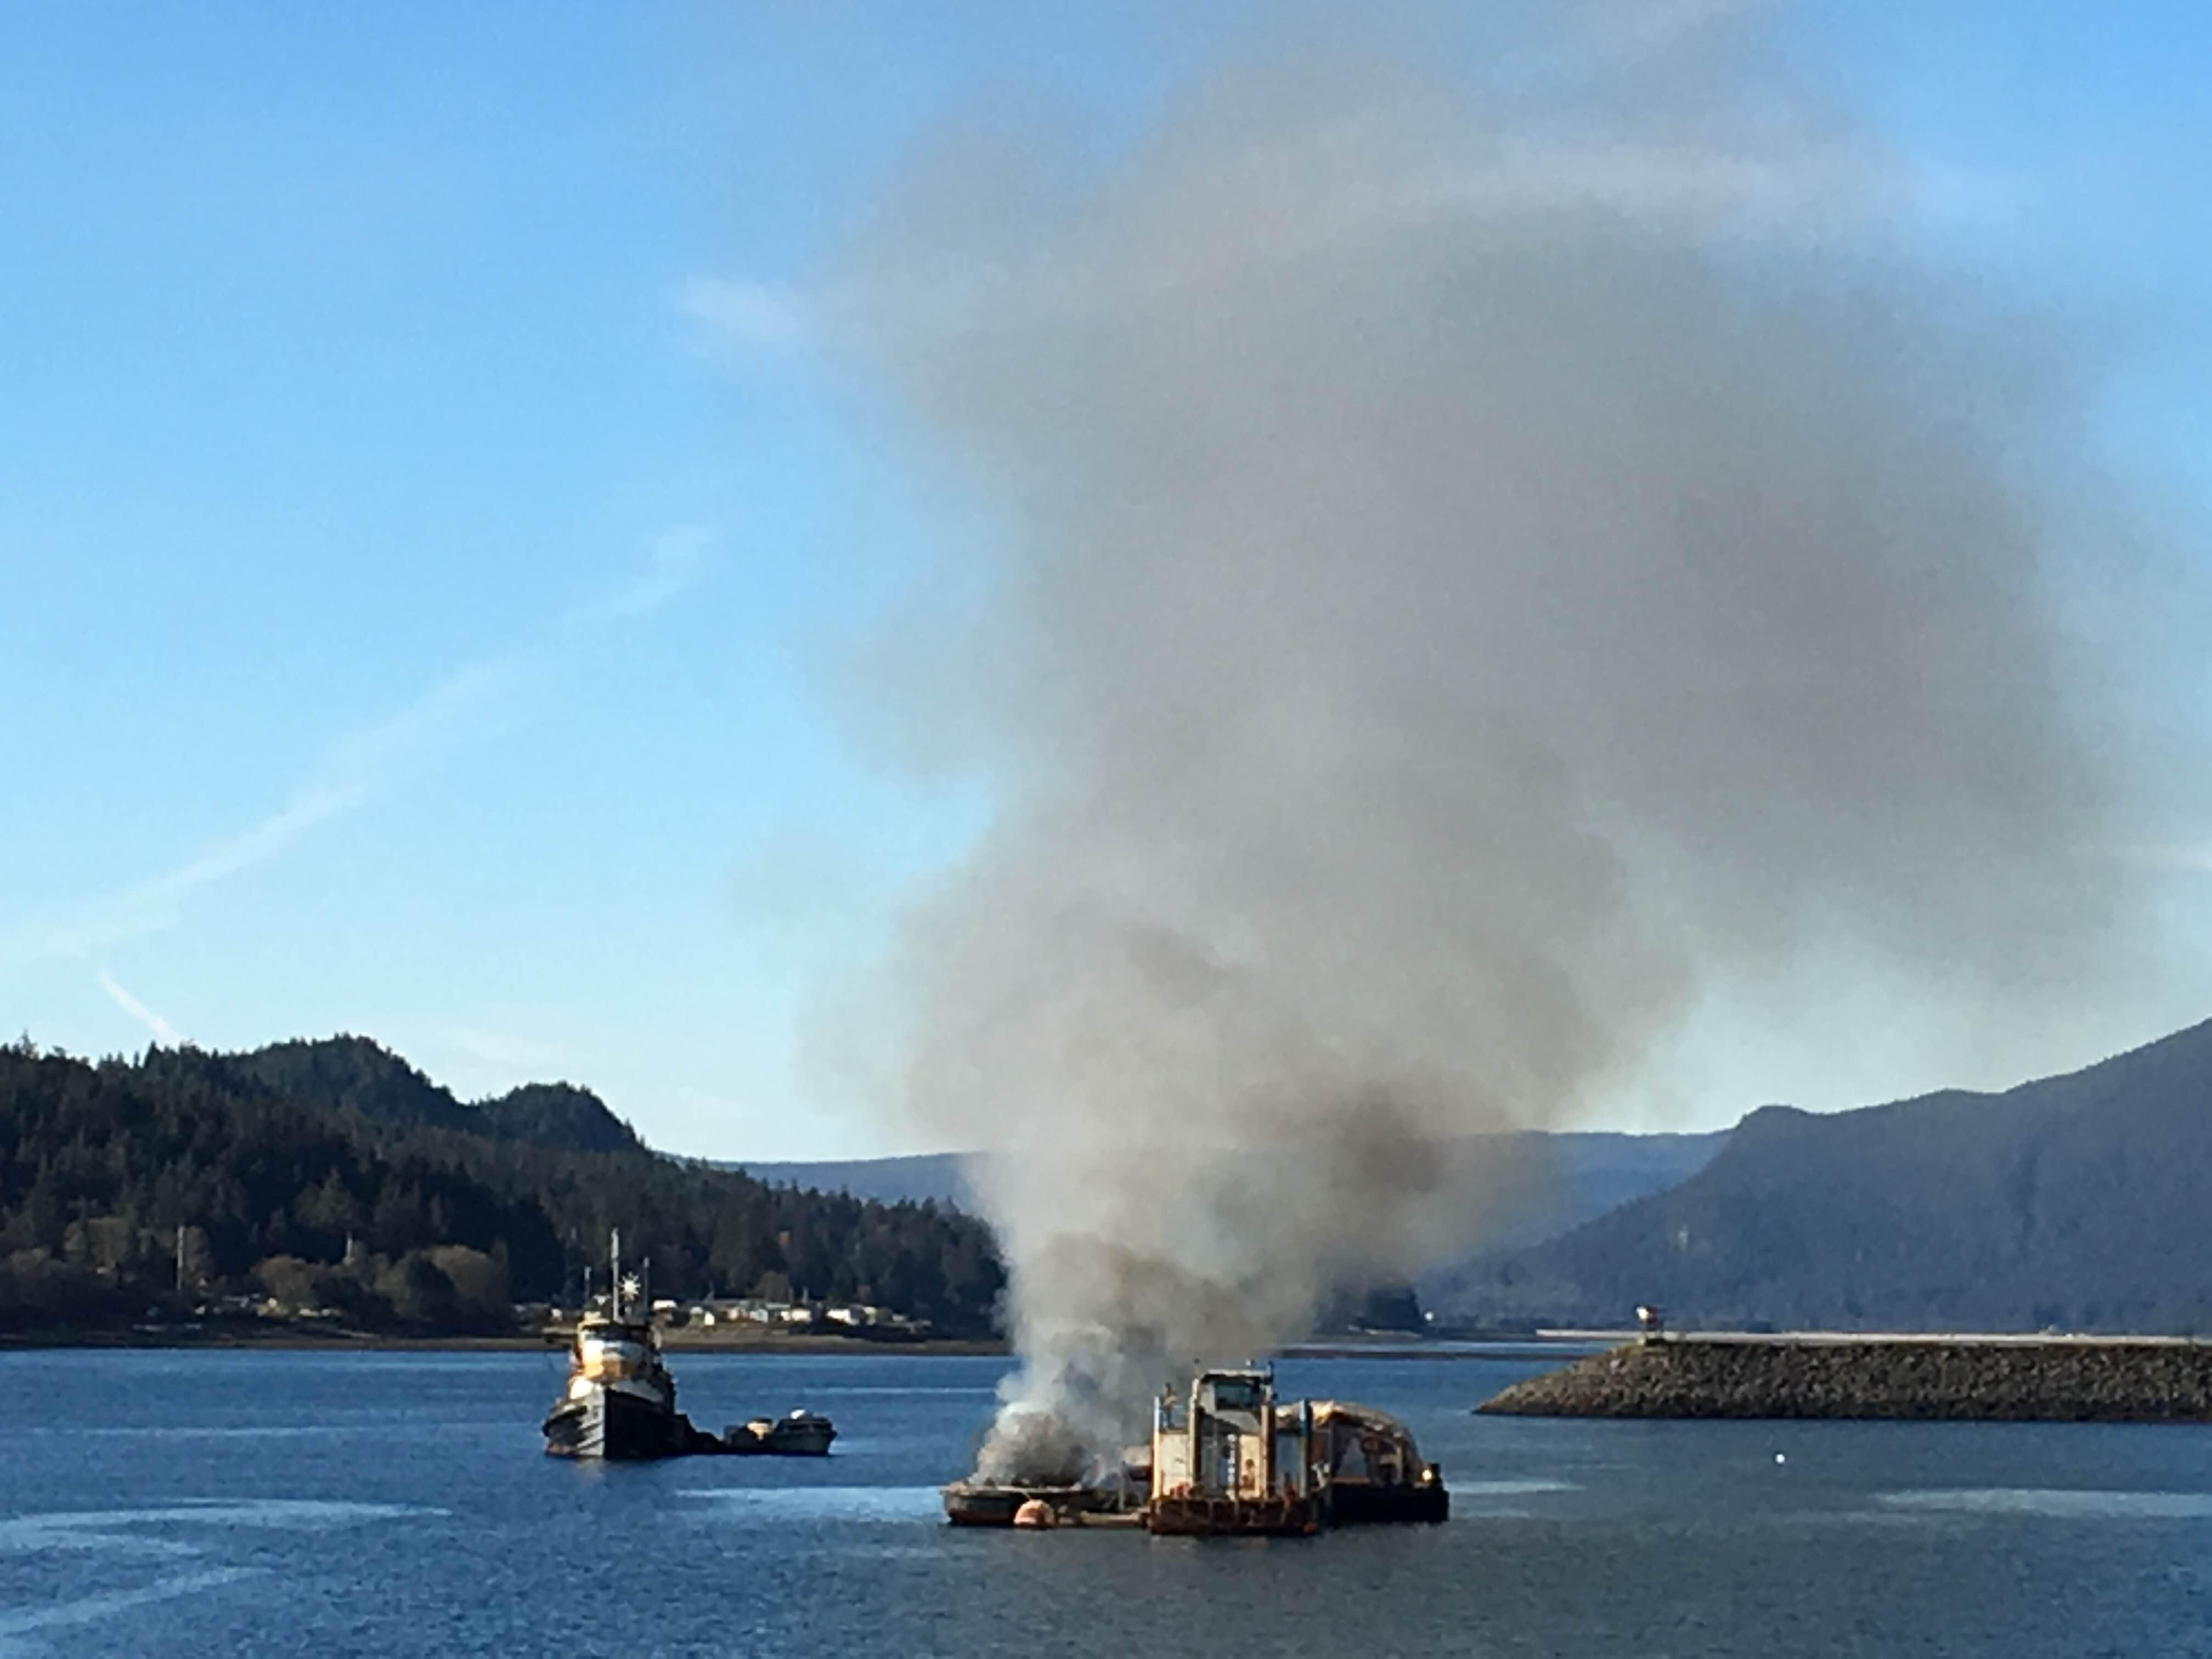 A small barge burns near Aurora Harbor along Egan Drive. (Lakeidra Chavis/ KTOO)